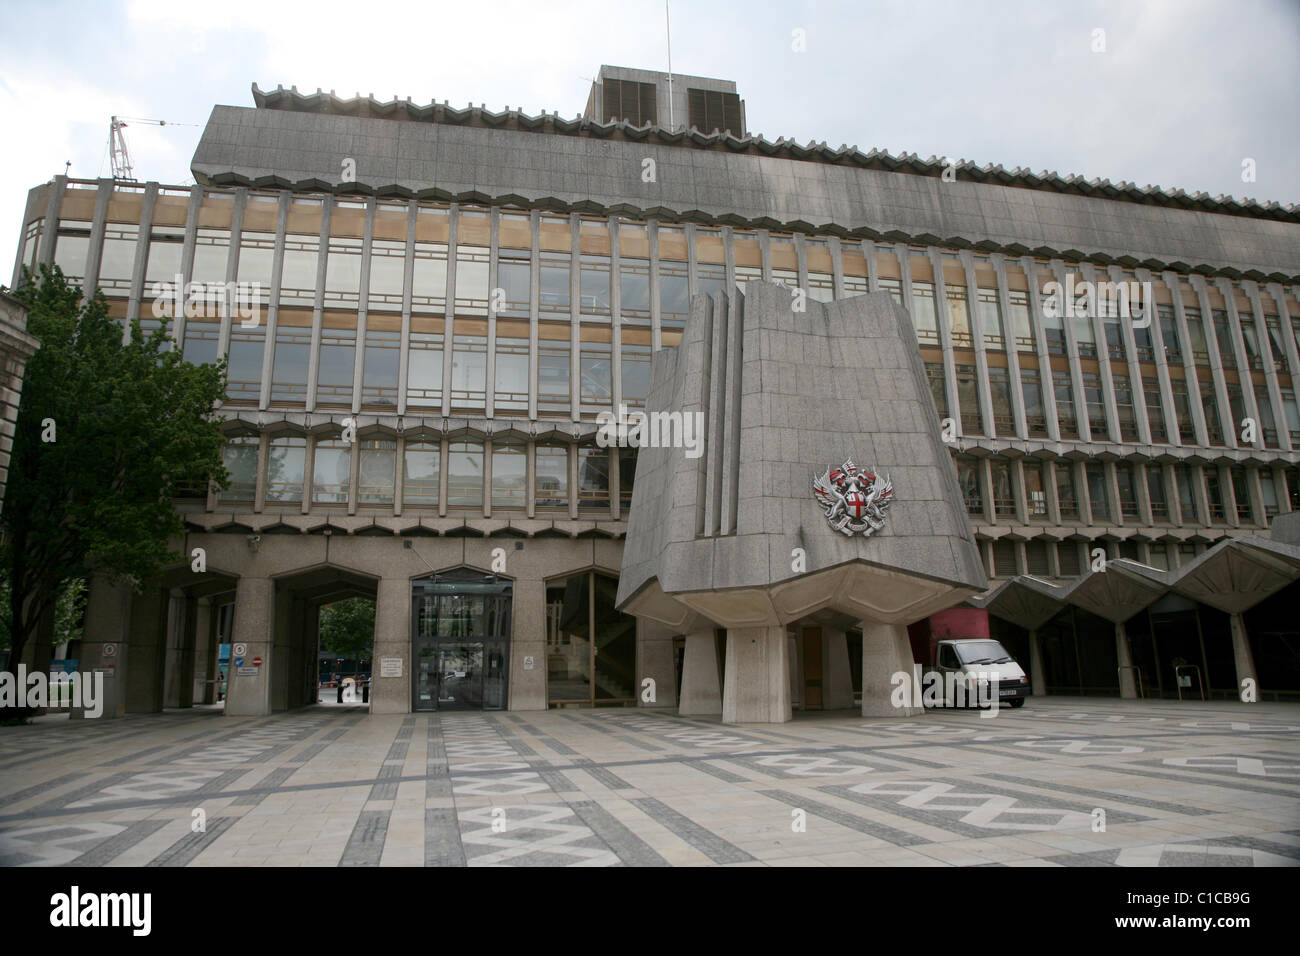 Vista generale gv di Guildhall in Barbican, Londra, Inghilterra. Immagini Stock